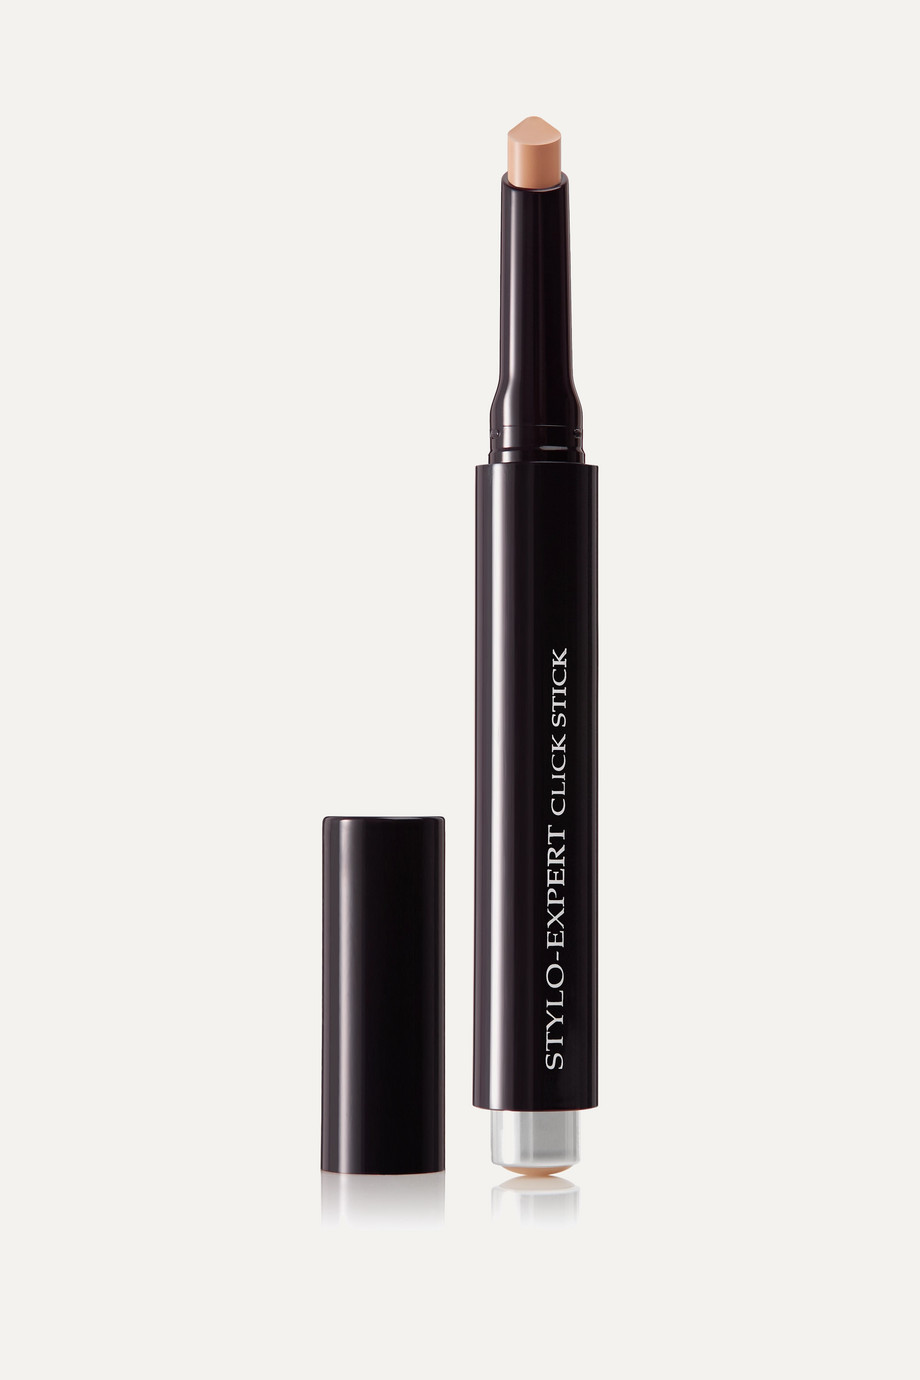 BY TERRY Correcteur de teint hybride Stylo-Expert Click Stick, Amber Brown No.11